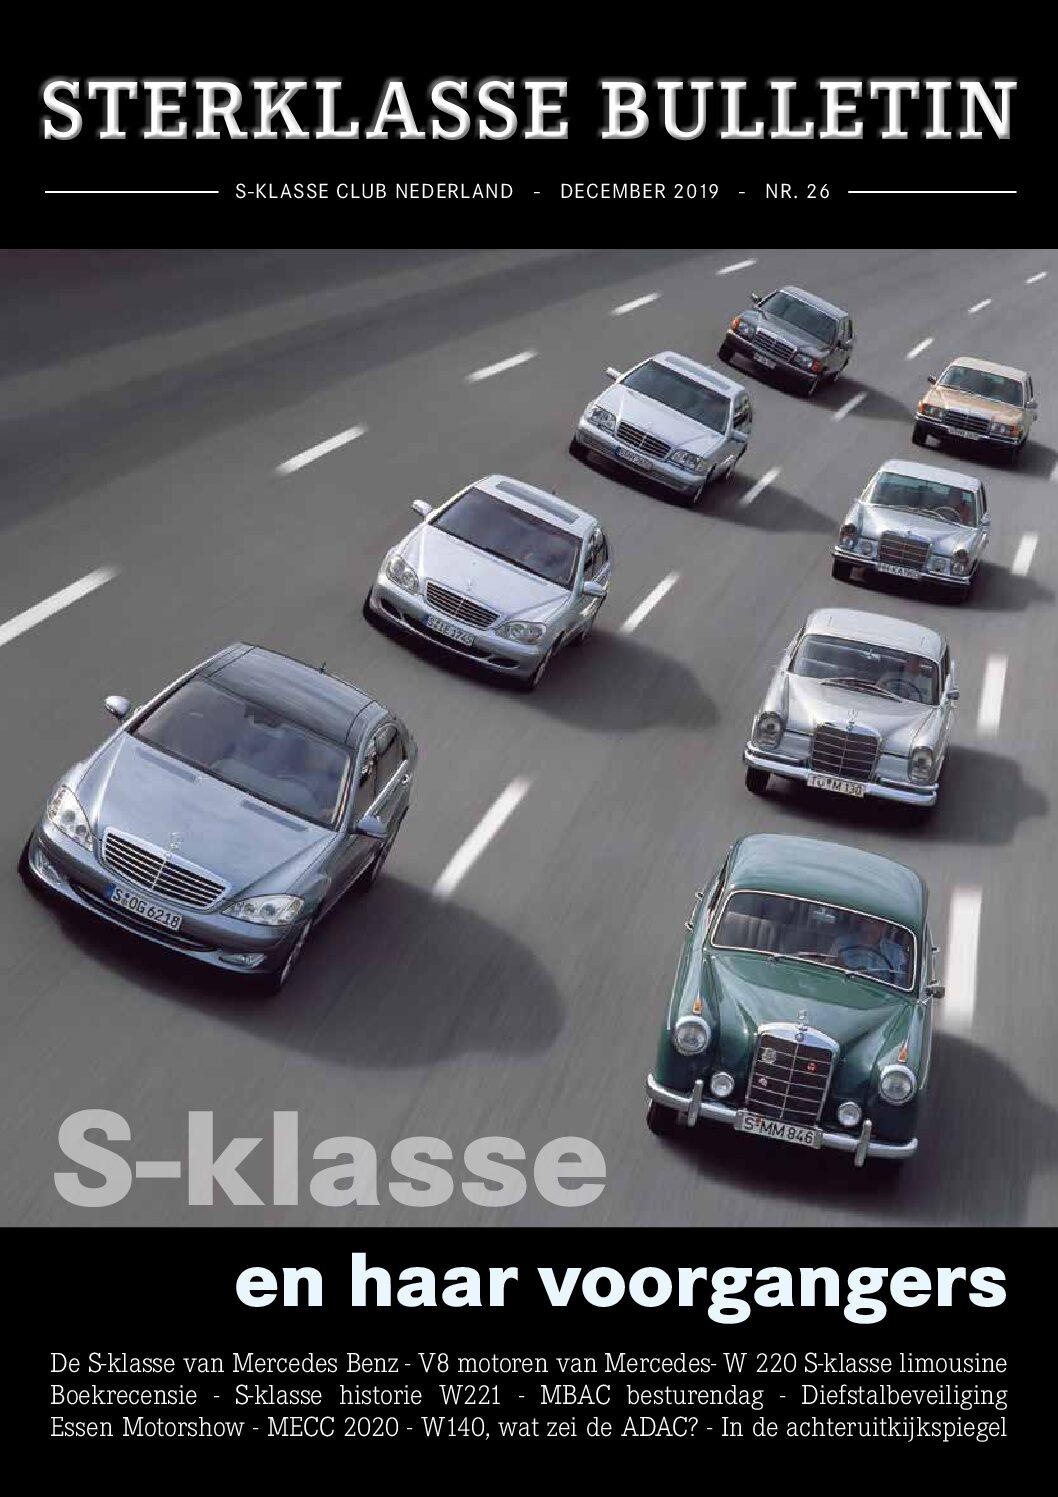 Sterklasse Bulletin 13 SKCN Mercedes-Benz S-Klasse Club Nederland